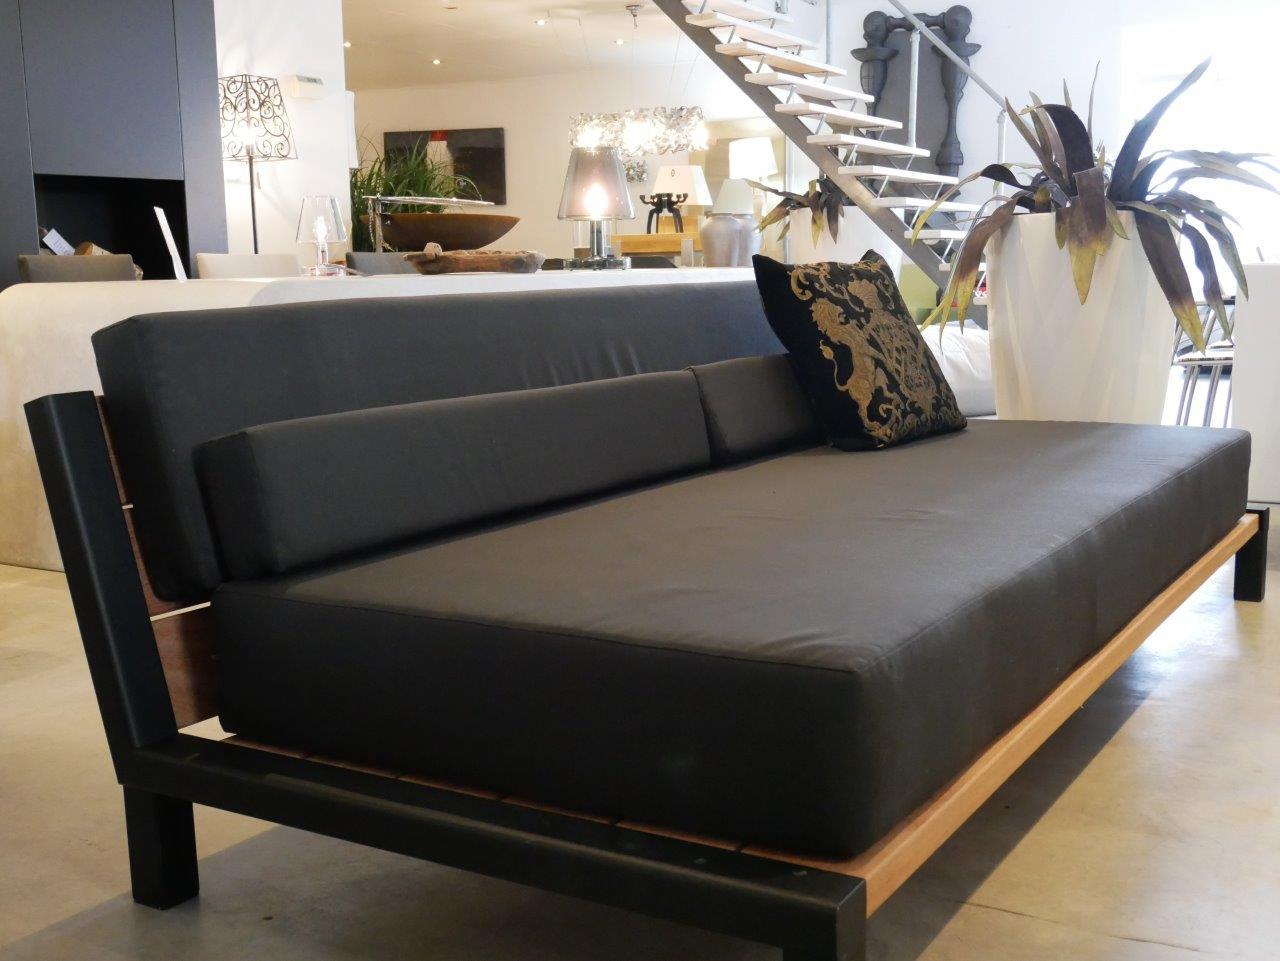 Maatwerk lounge - Day Lounge - Hardhout